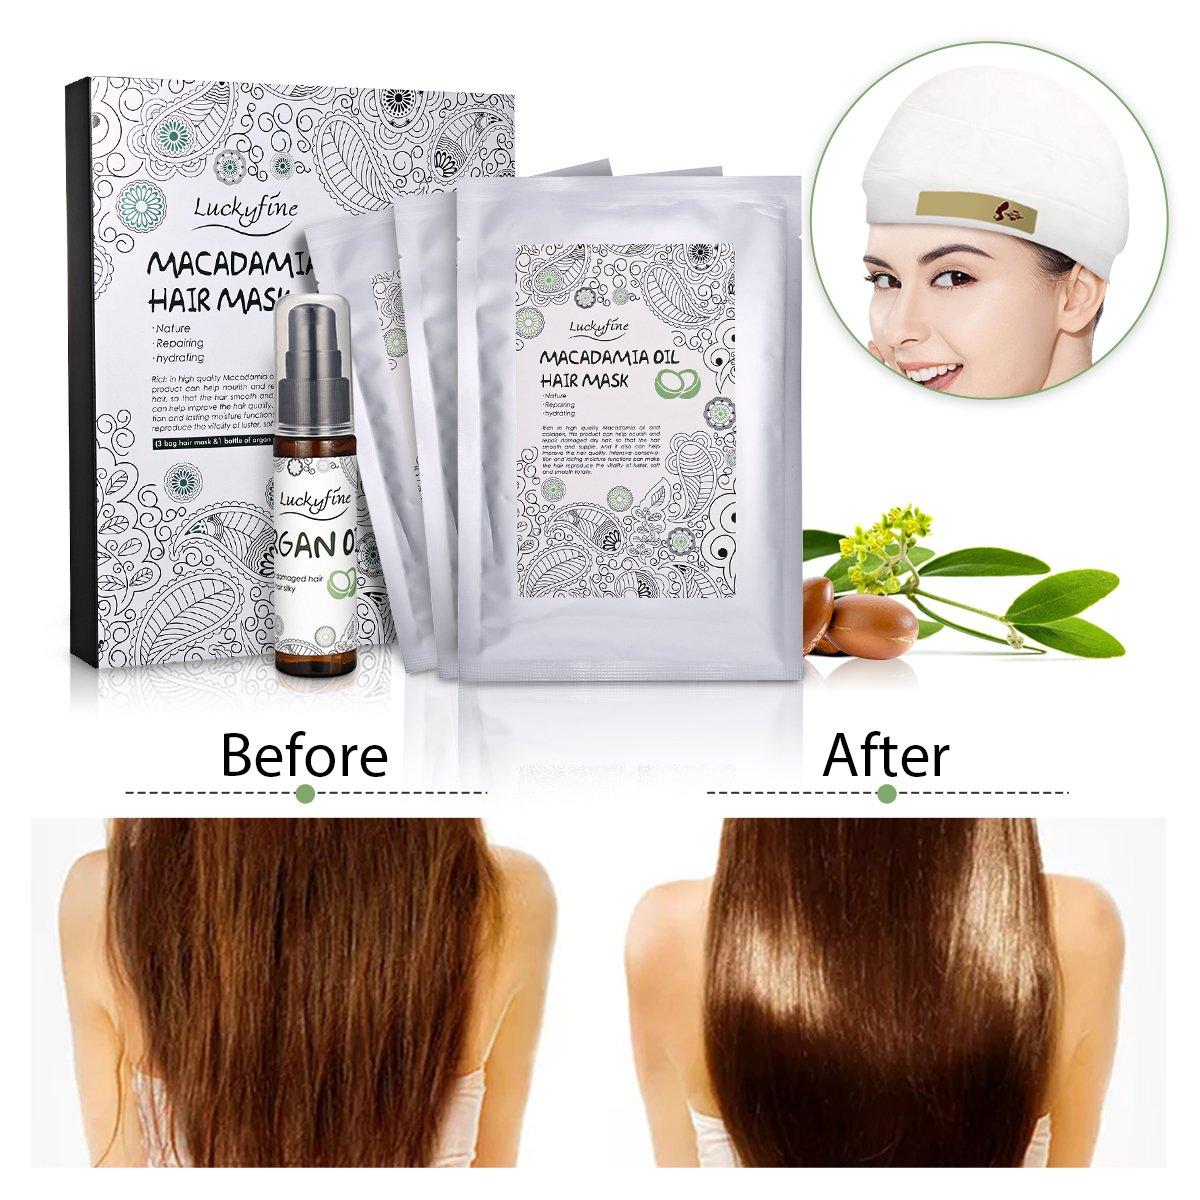 Luckyfine 3pcs Hair Mask Deep Moisture & Nourishing Hair Sheet Mask for Dry or Damaged Hair - with 30 ml Argan Oil